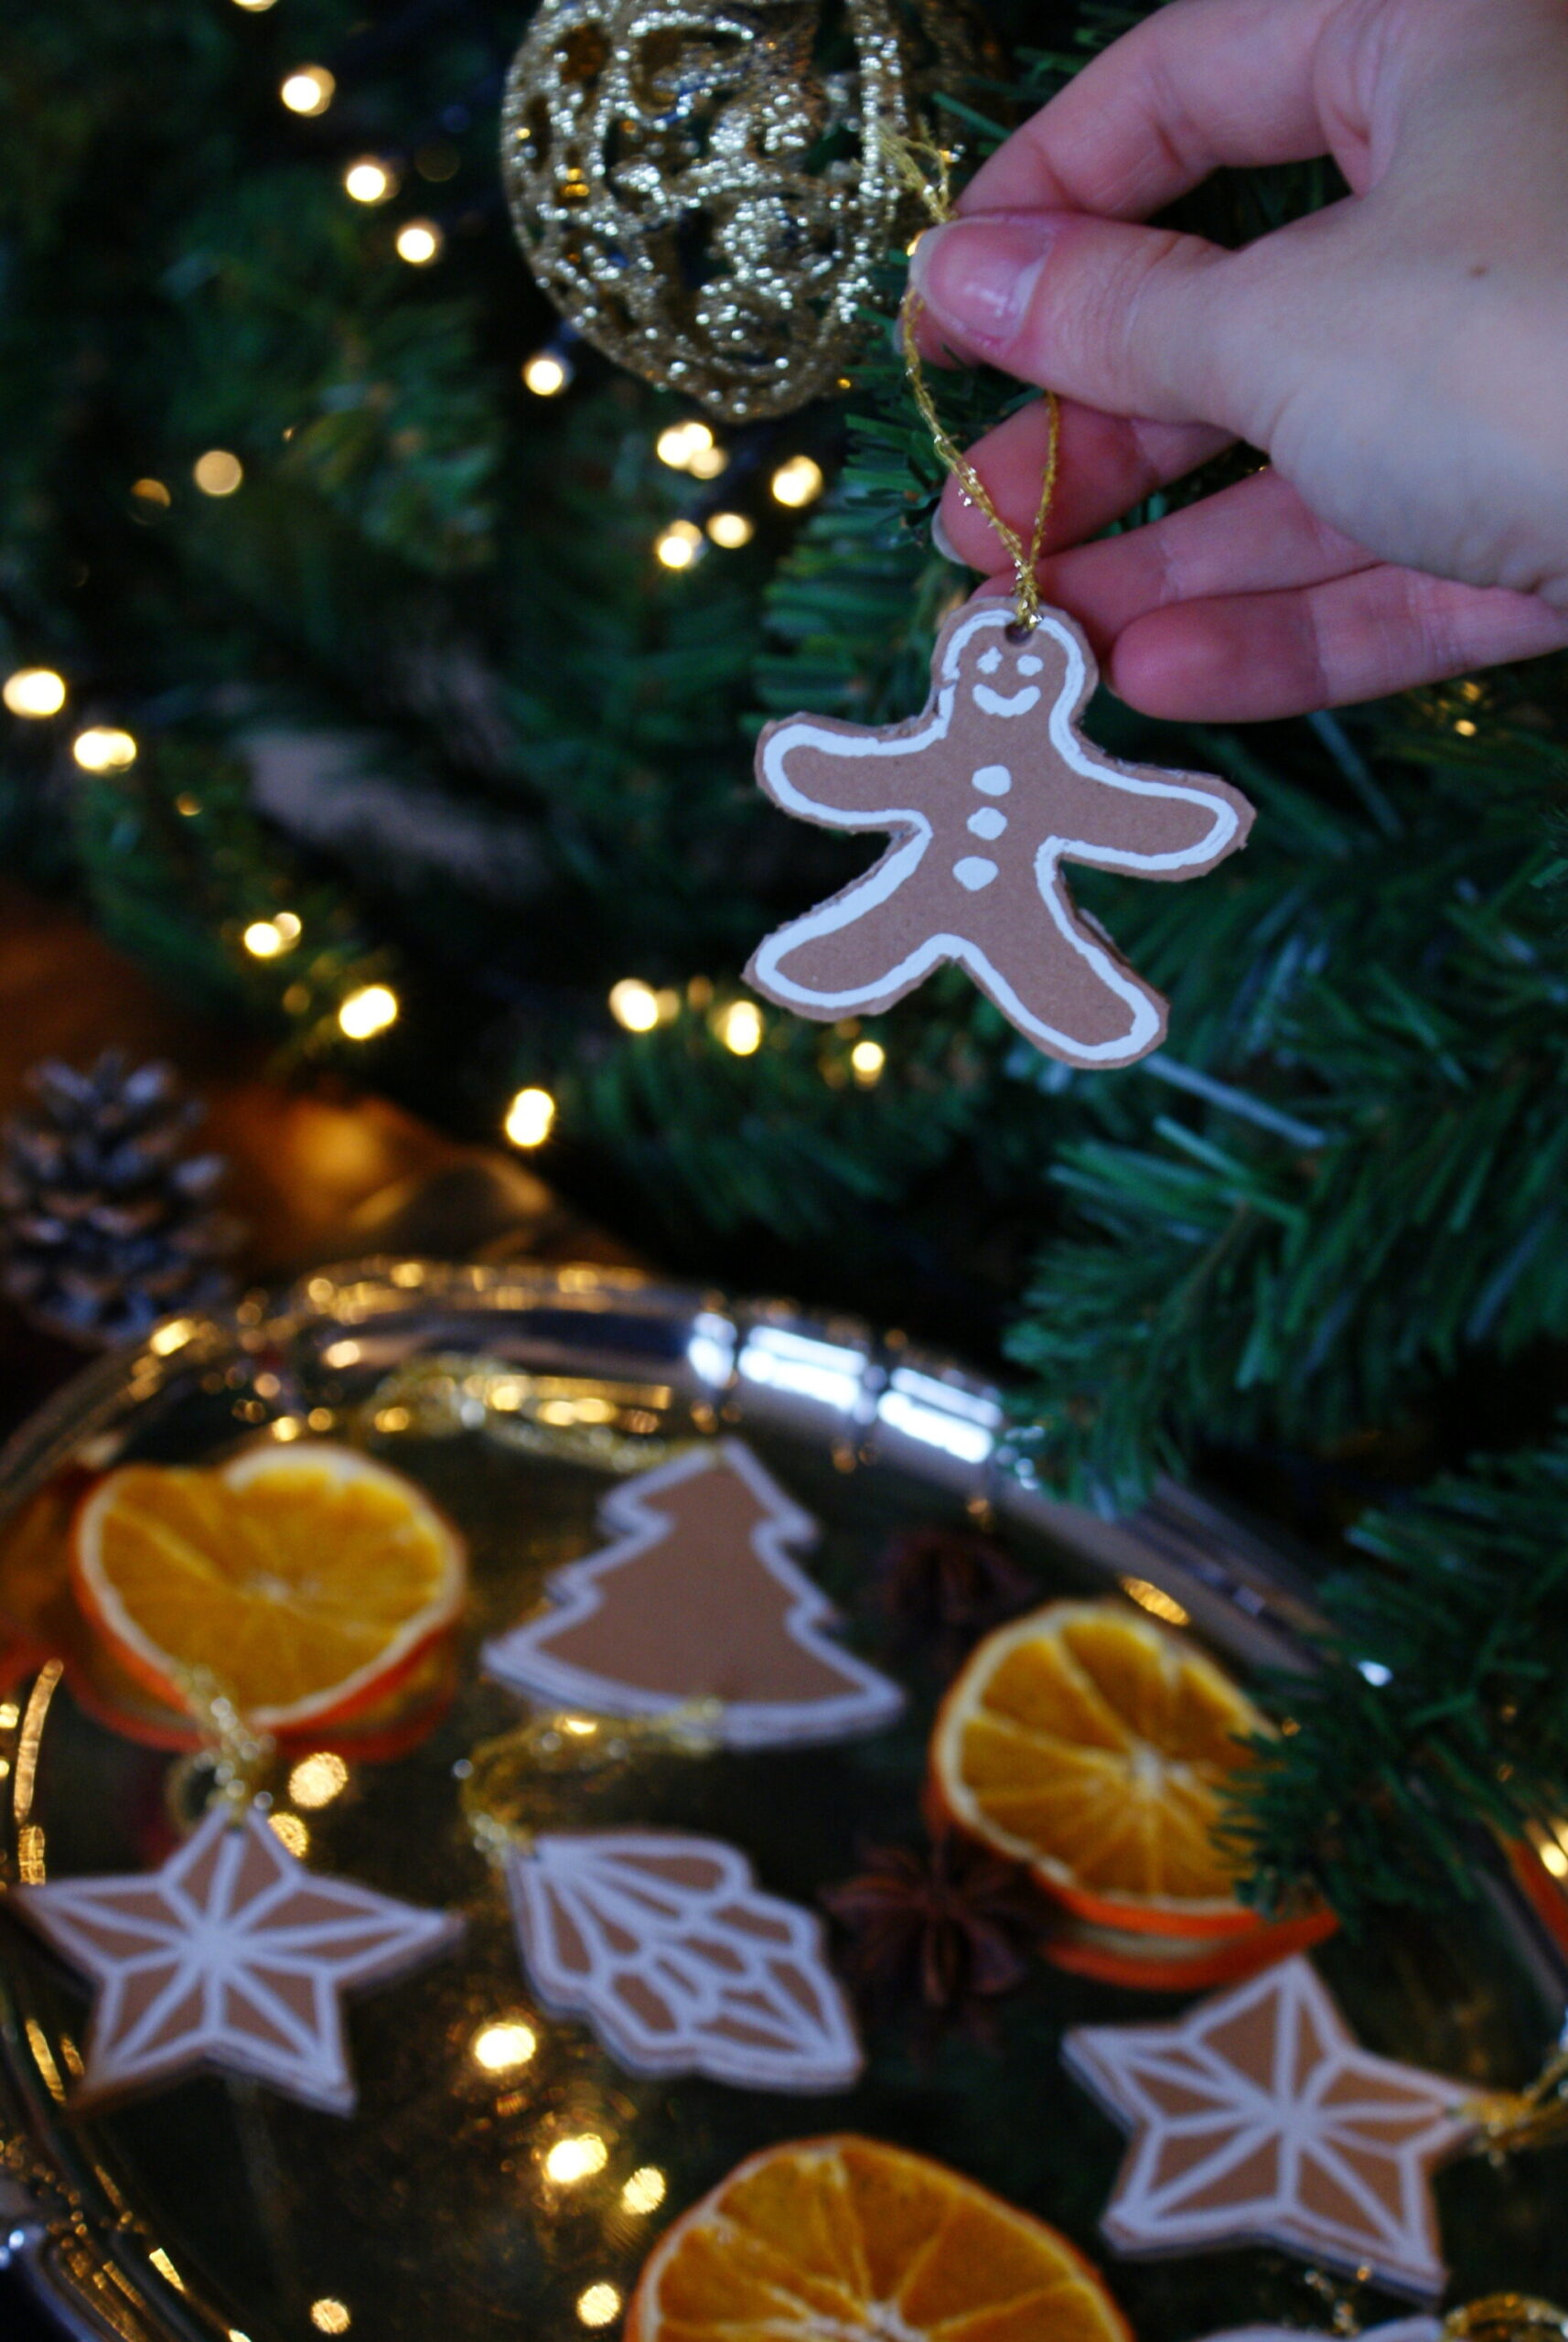 diy cardboard gingerbread cookies christmas tree ornaments idea easy last minute francinesplaceblog craft handmade